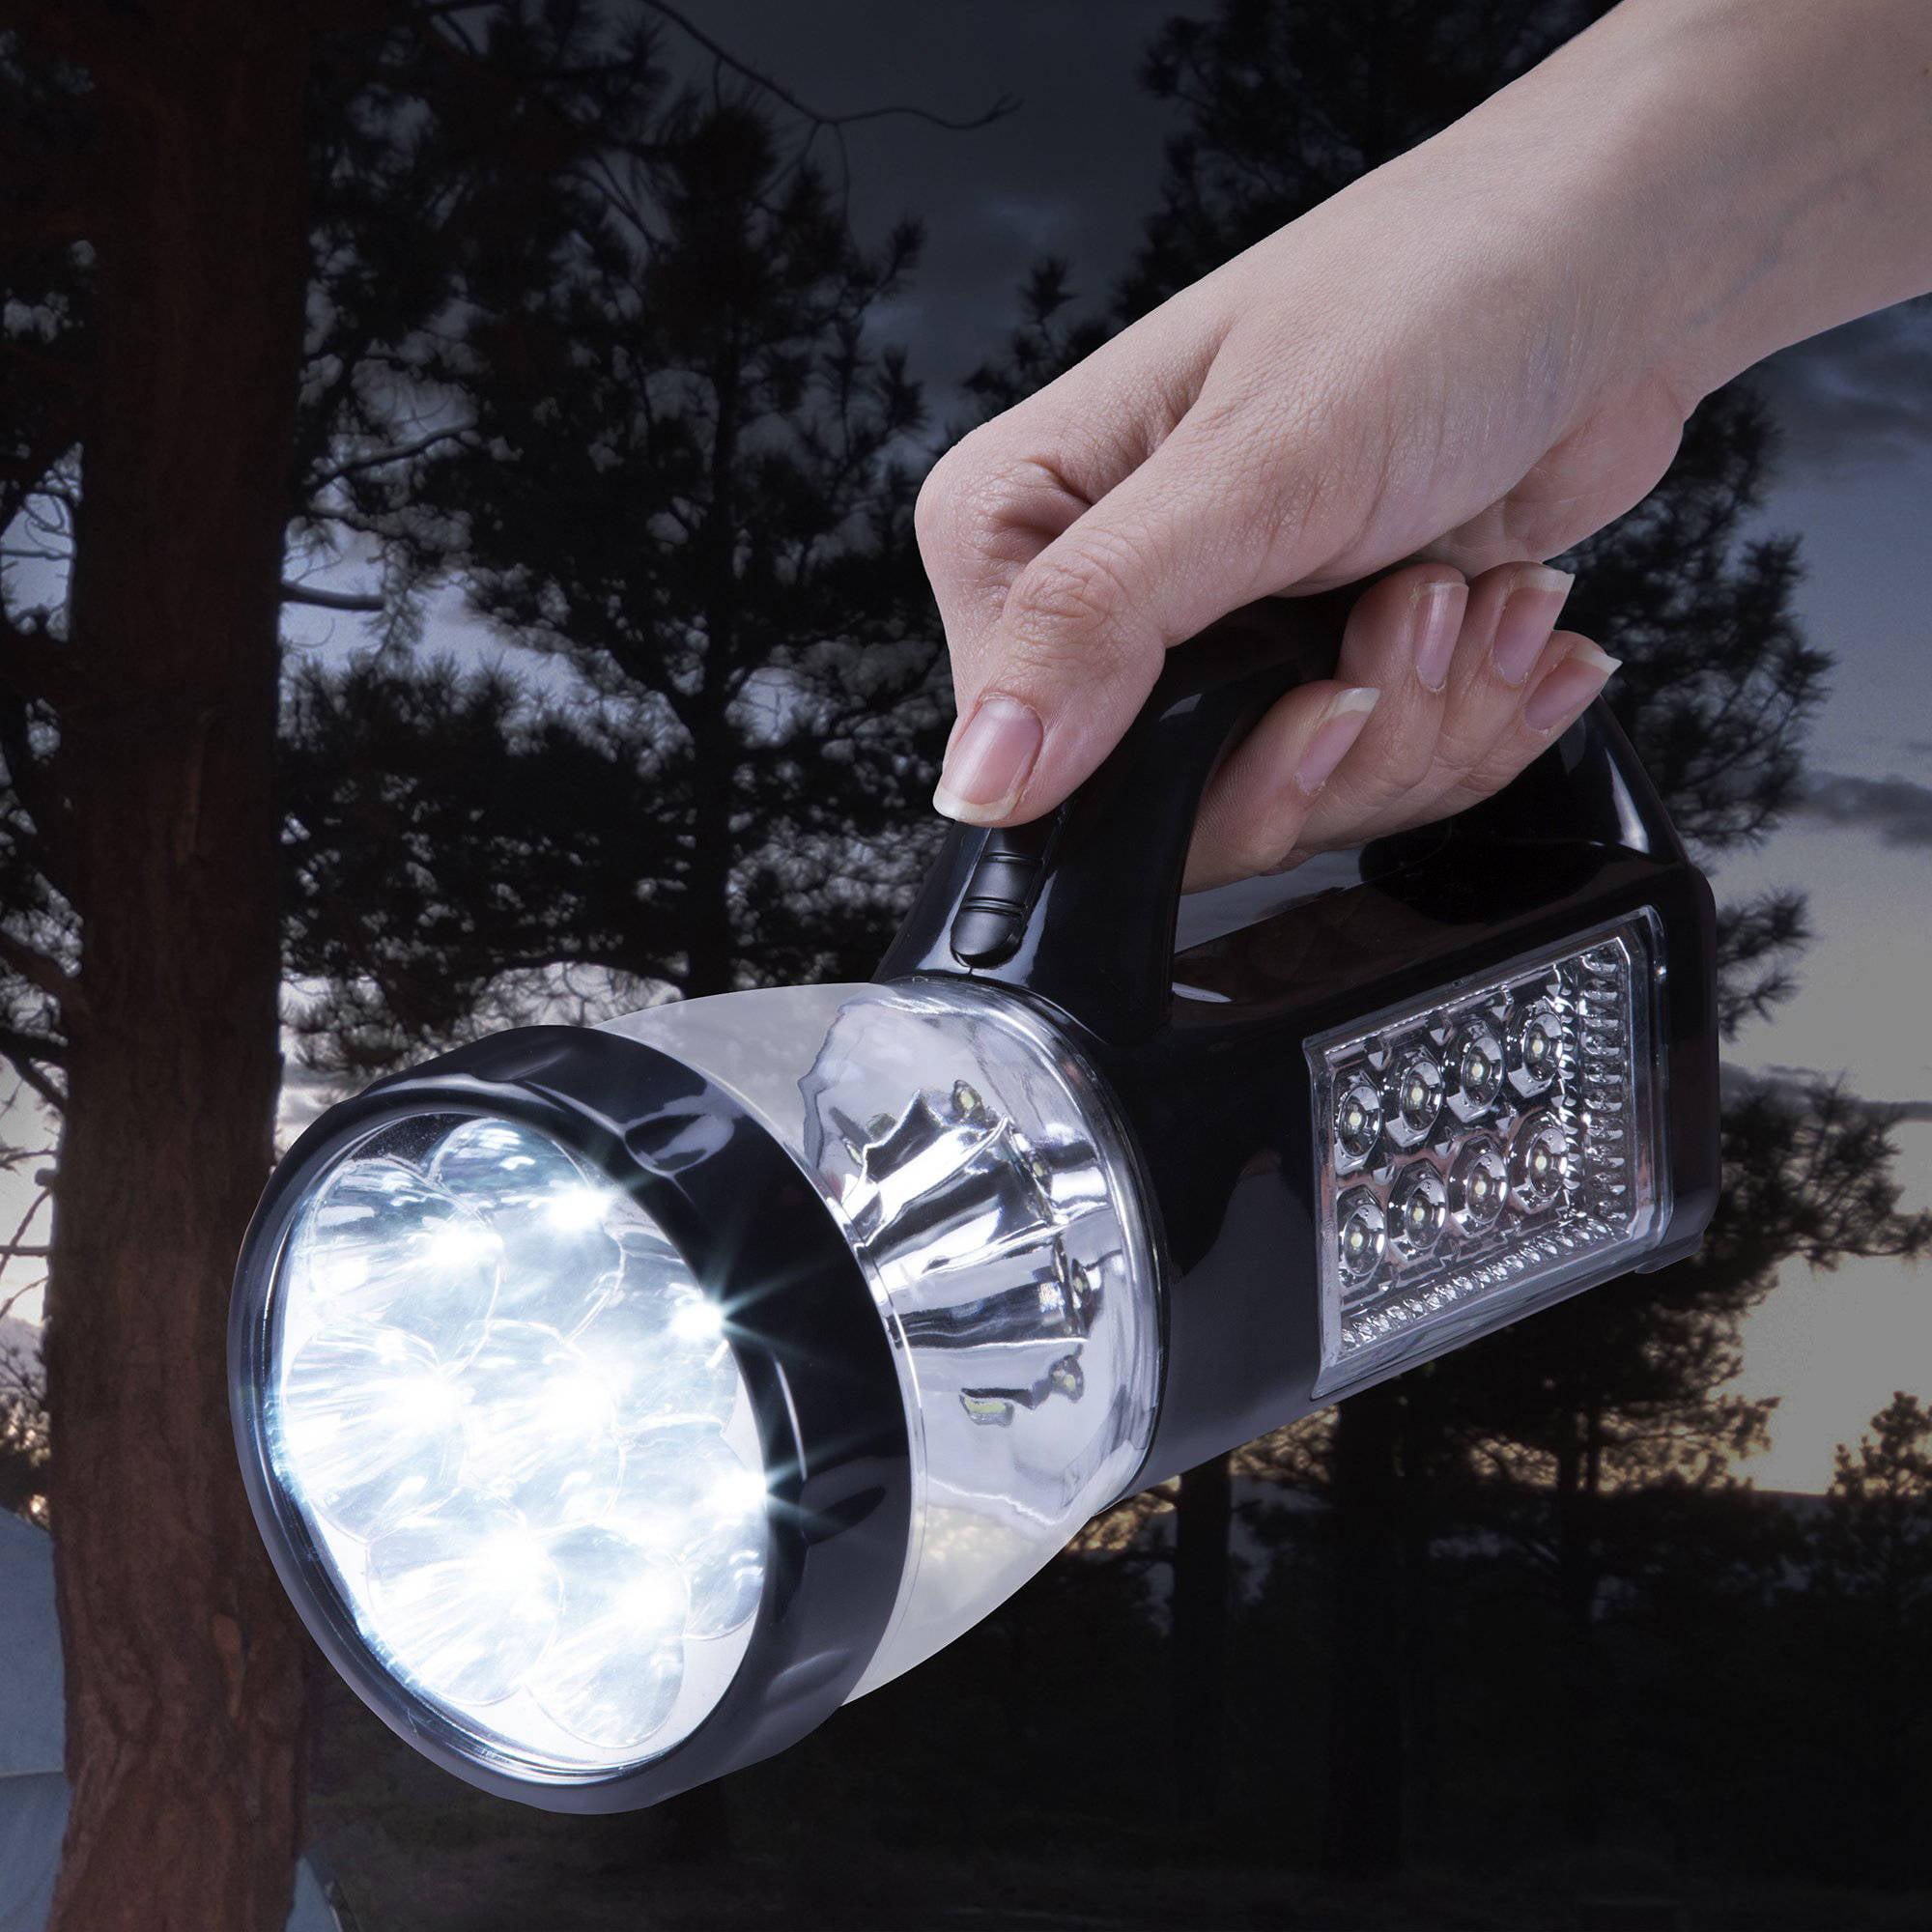 Wakeman Outdoors 3-in-1 LED Camping Lantern Flashlight